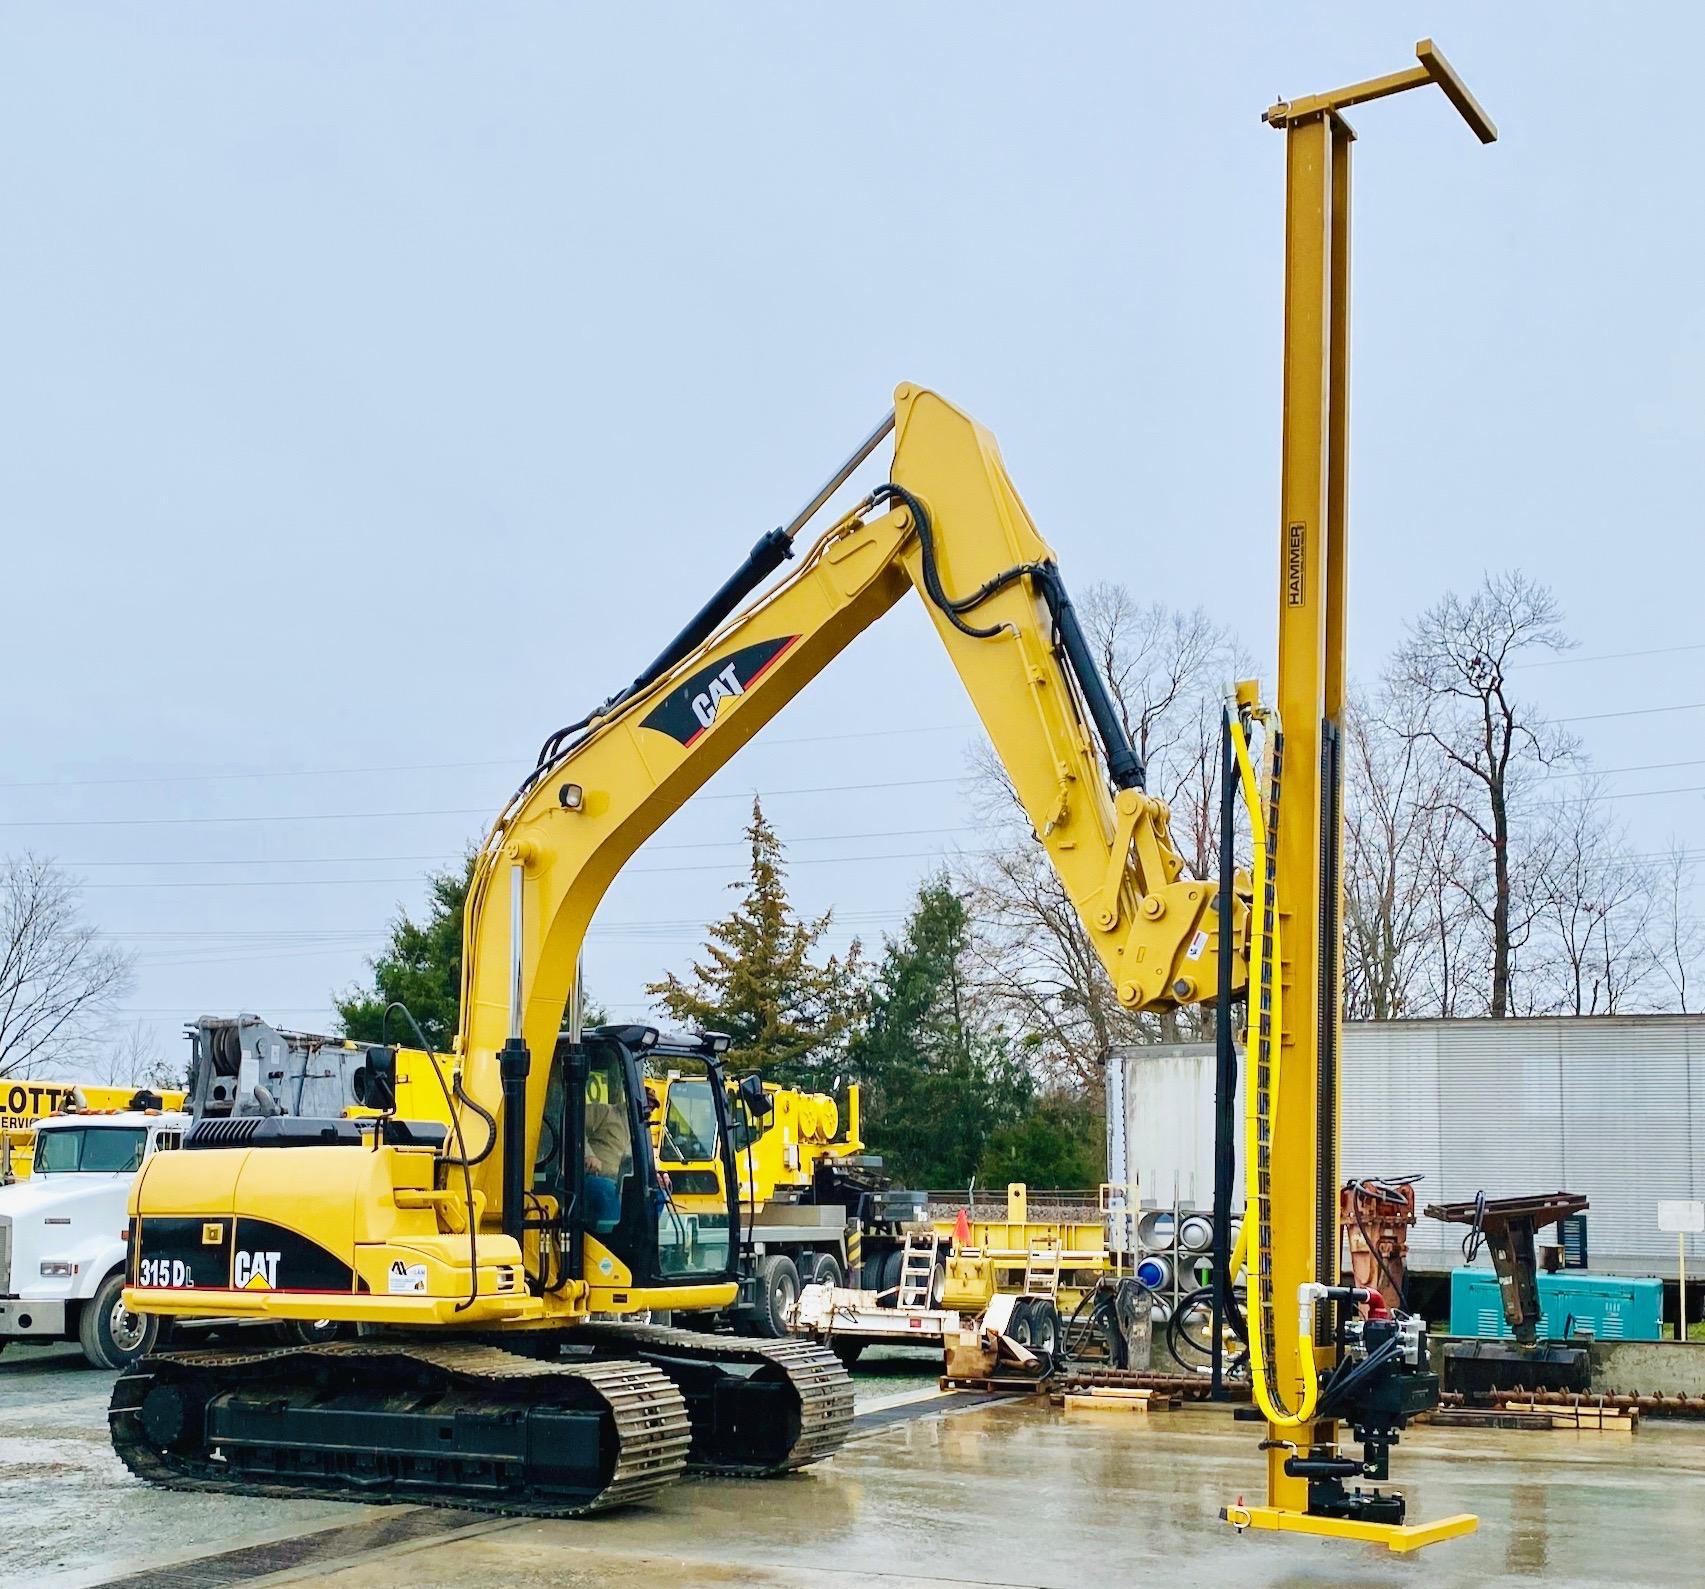 K6 Drill Mast Attachment for Excavator rock drilling